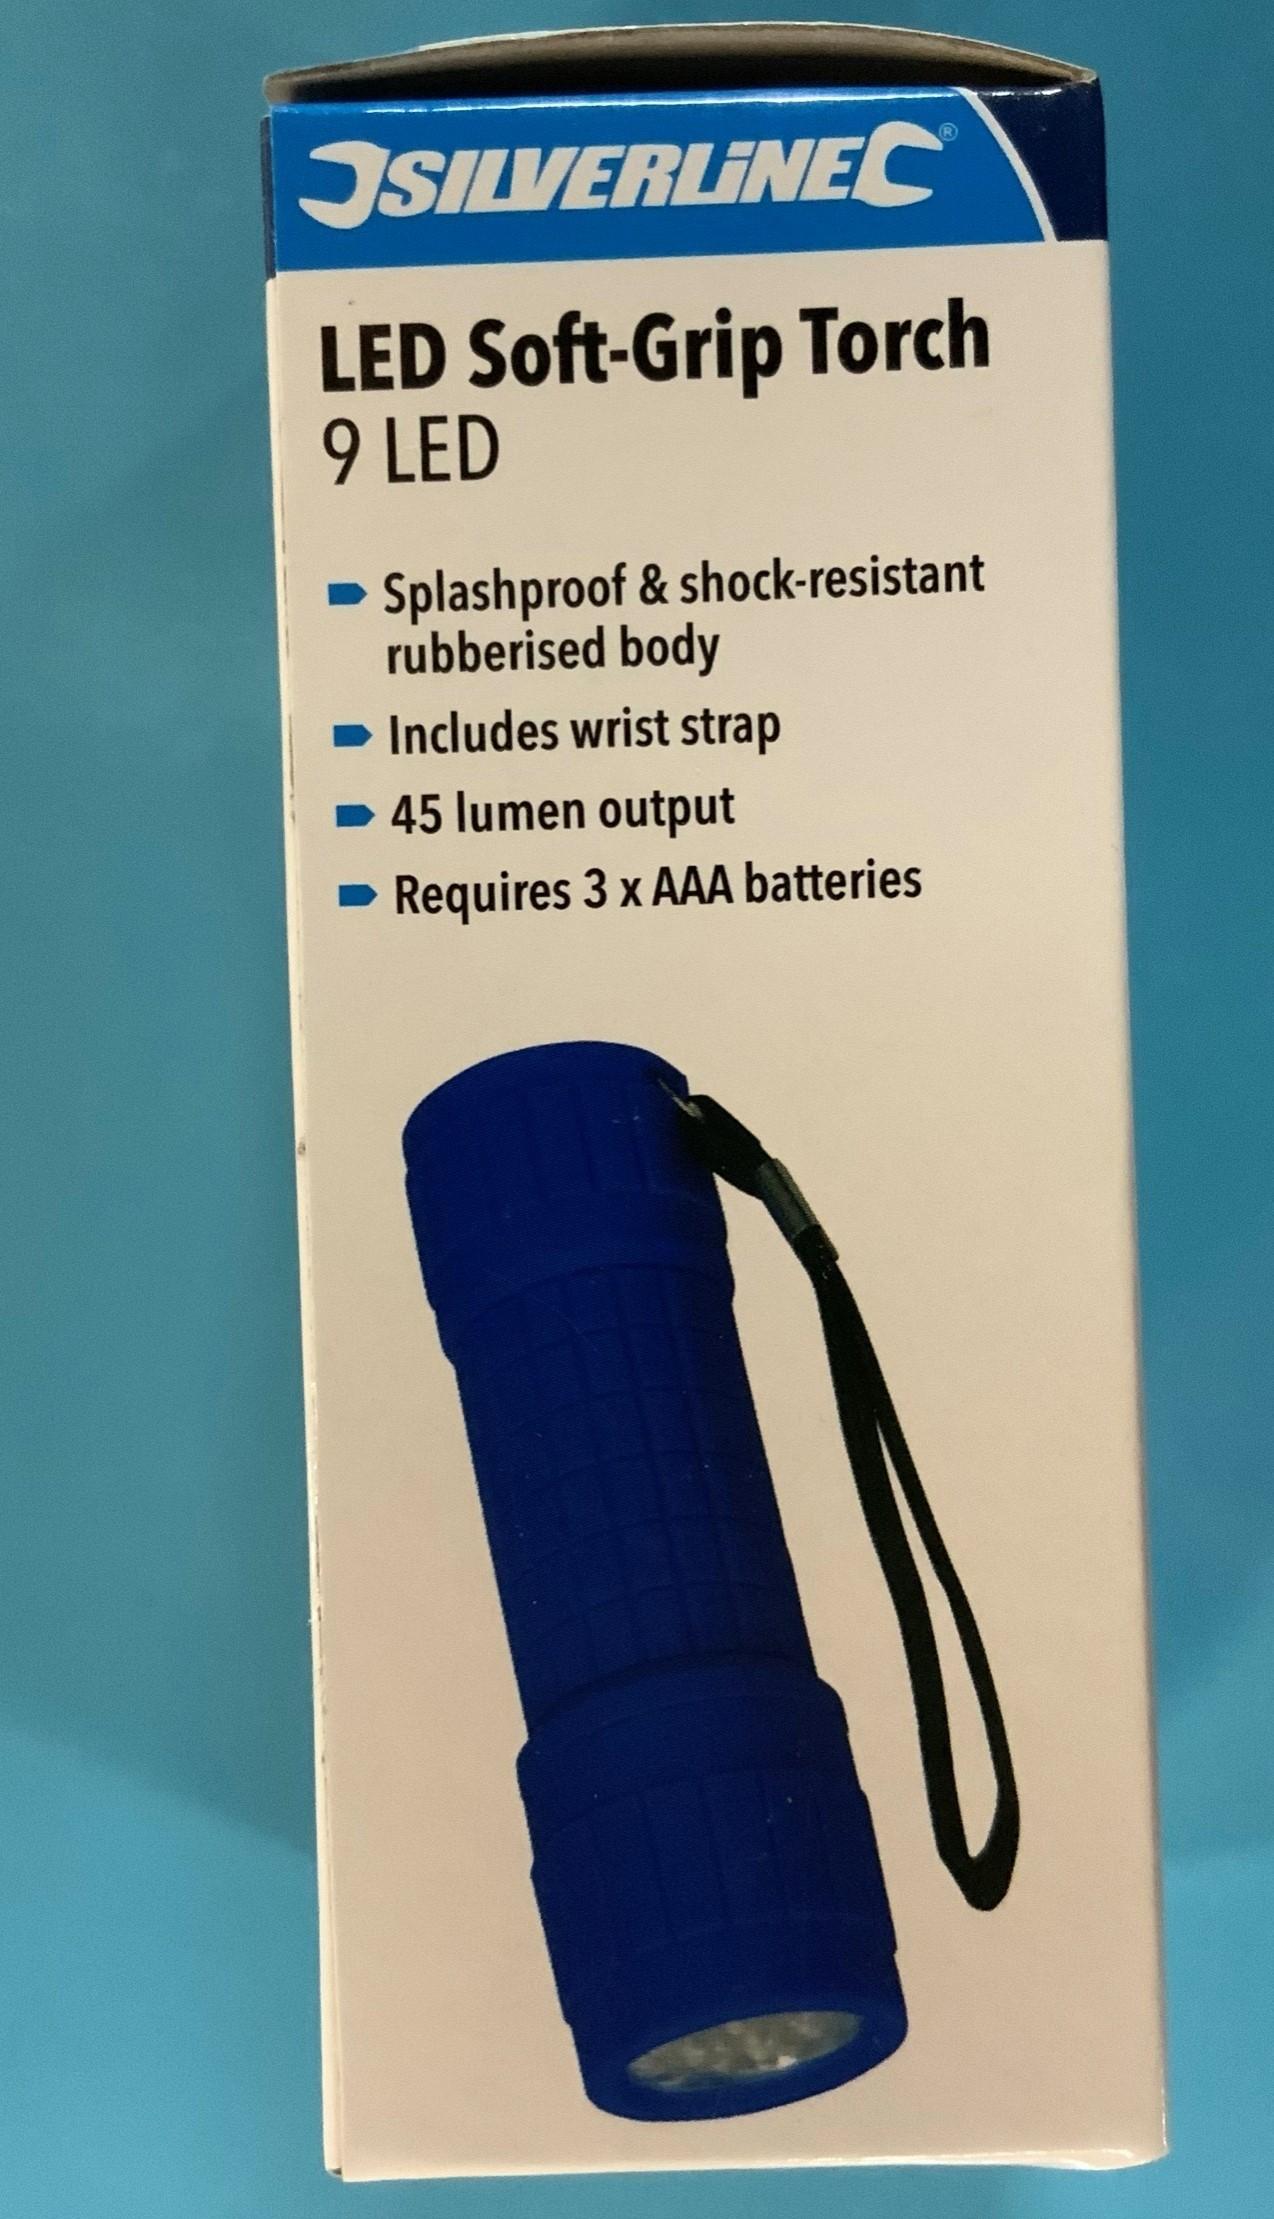 LED soft grip torch